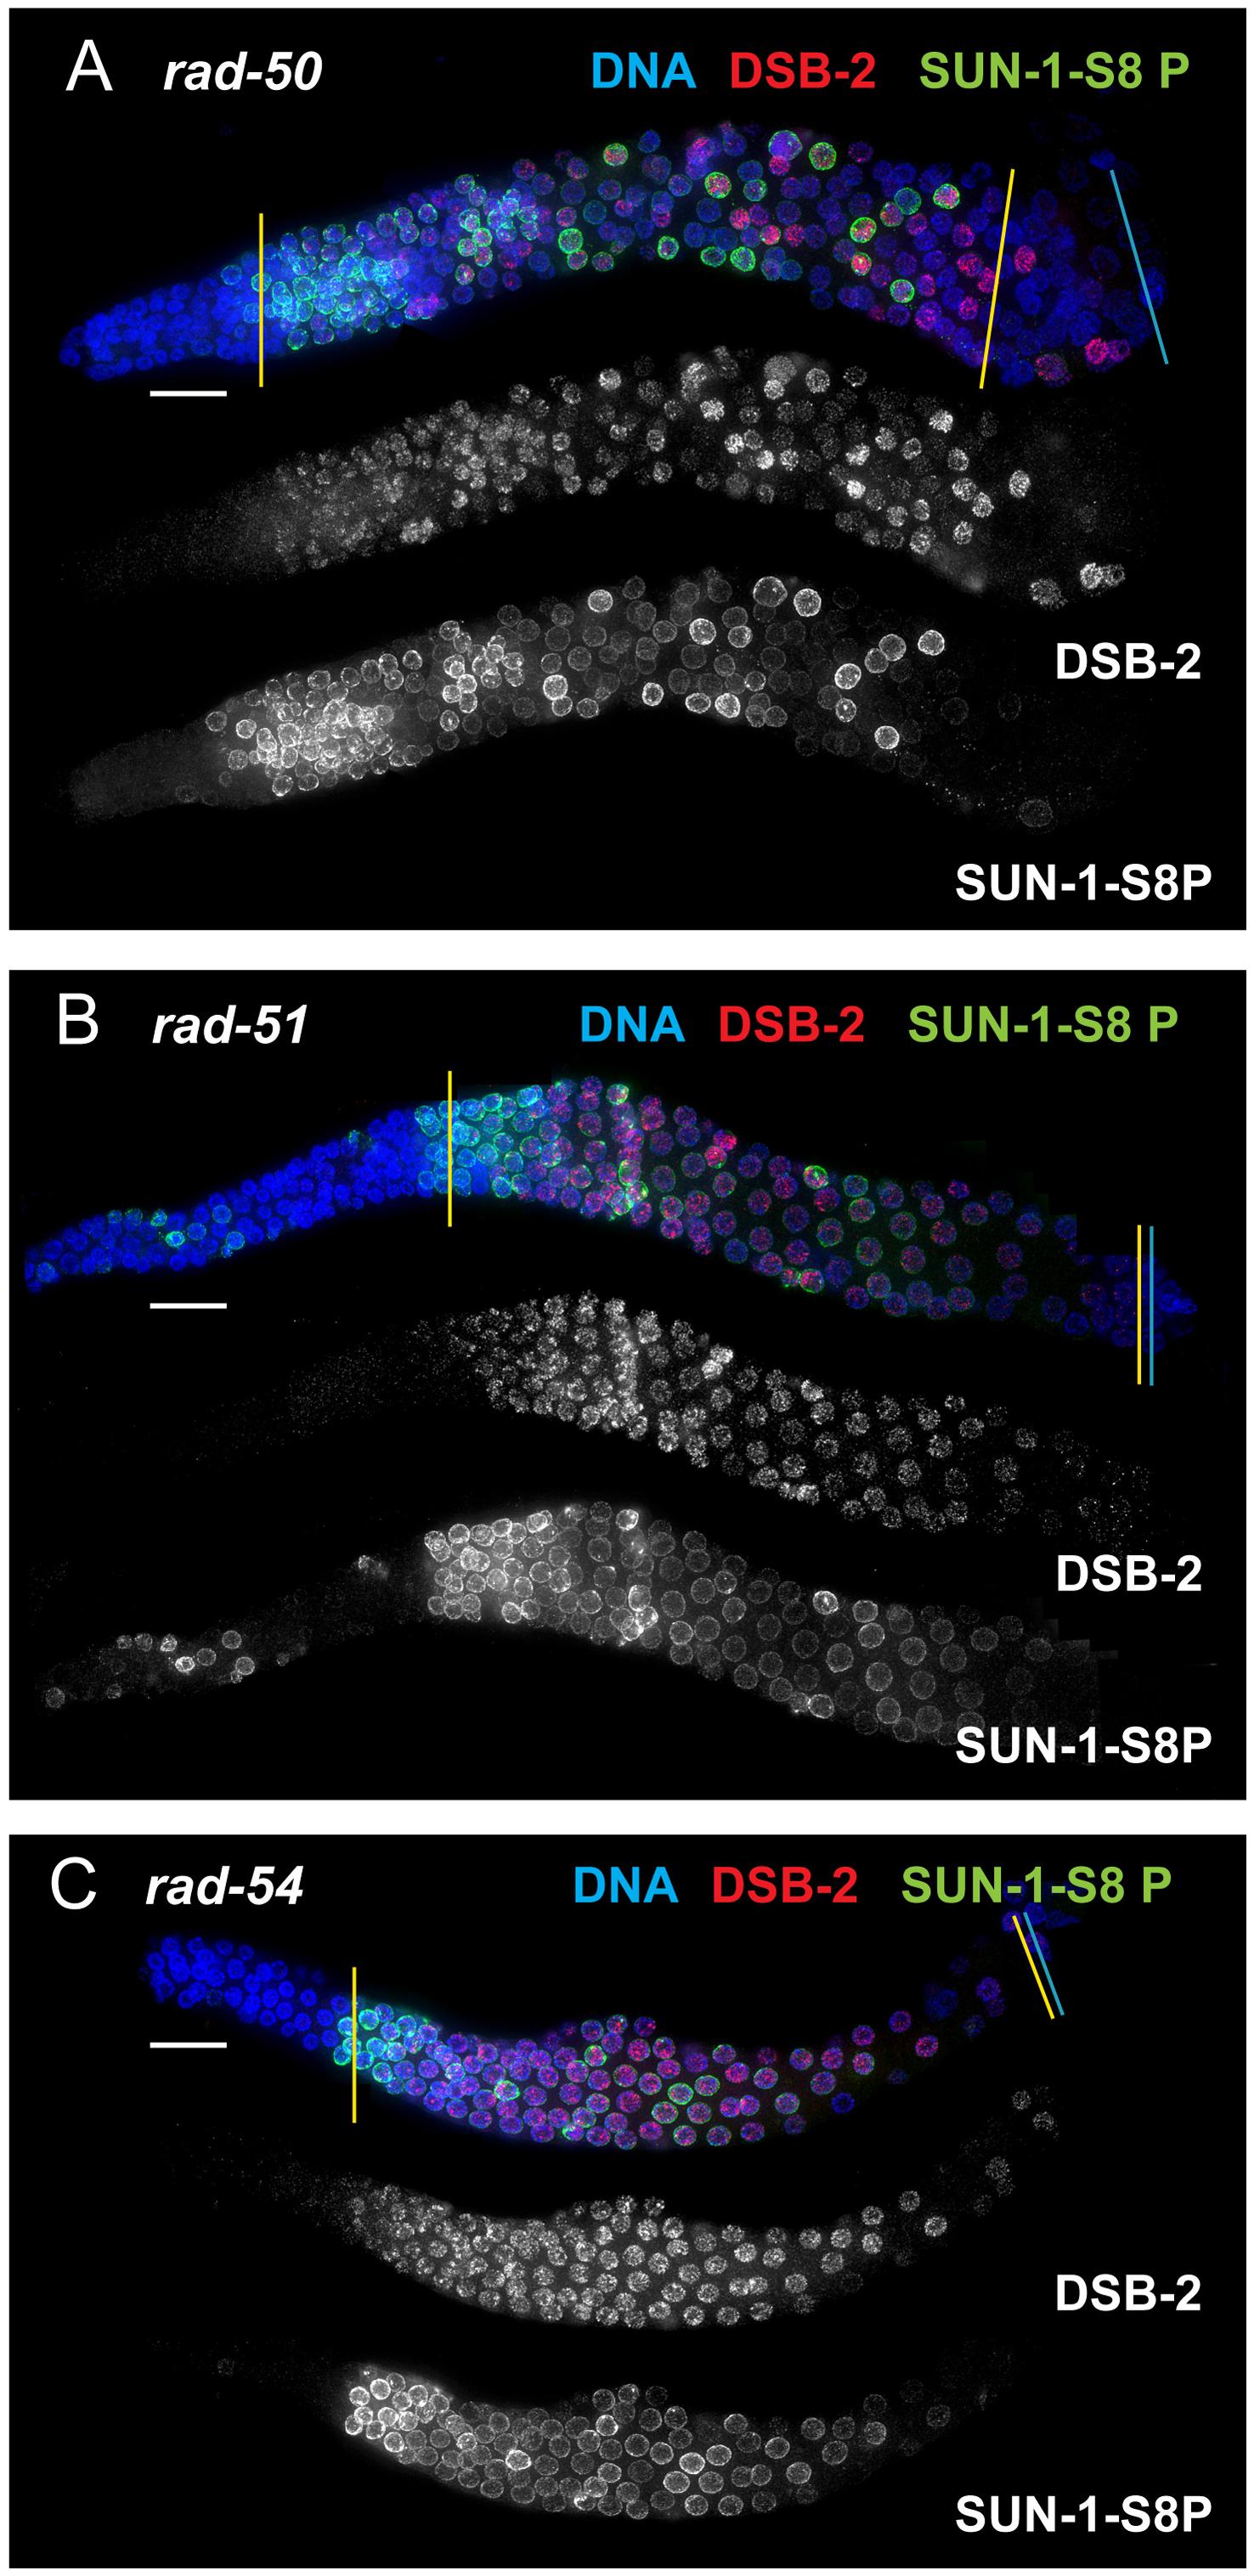 DSB-2 and SUN-1 S8P persist in mutants defective for DSB repair.